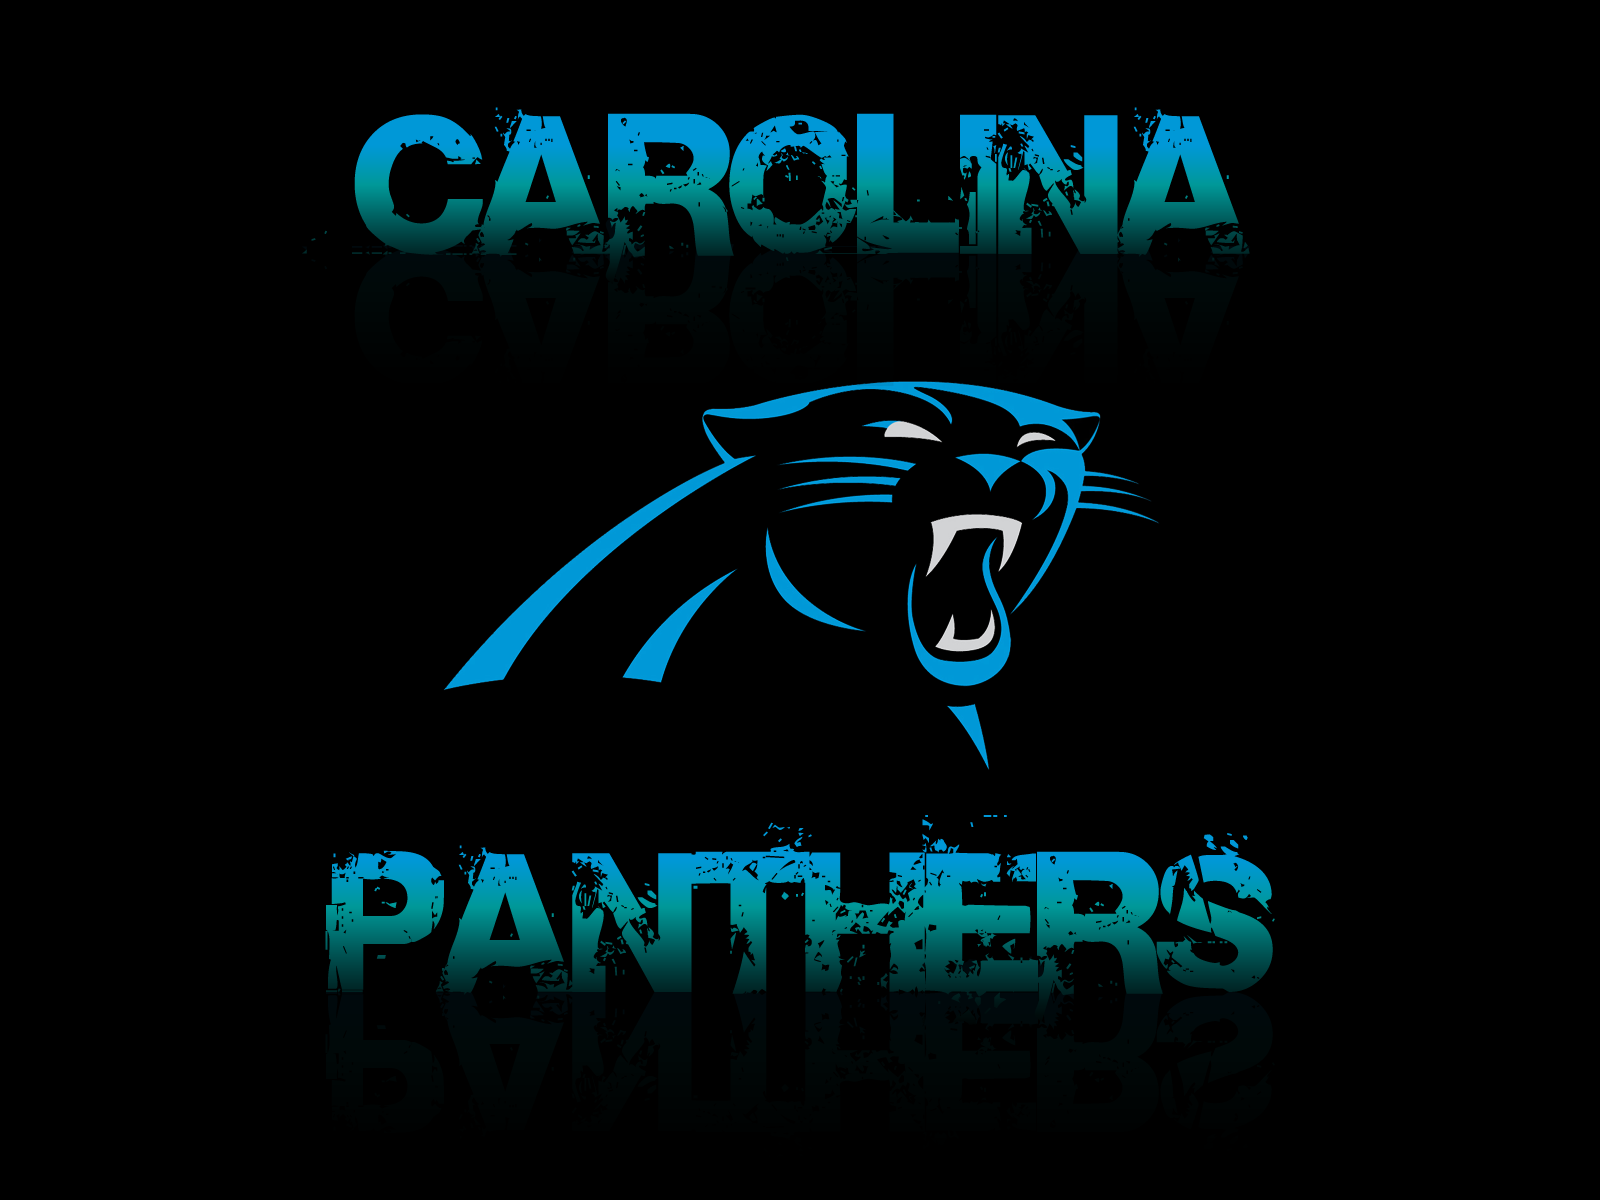 Carolina Panthers Wallpaper 1920x1080